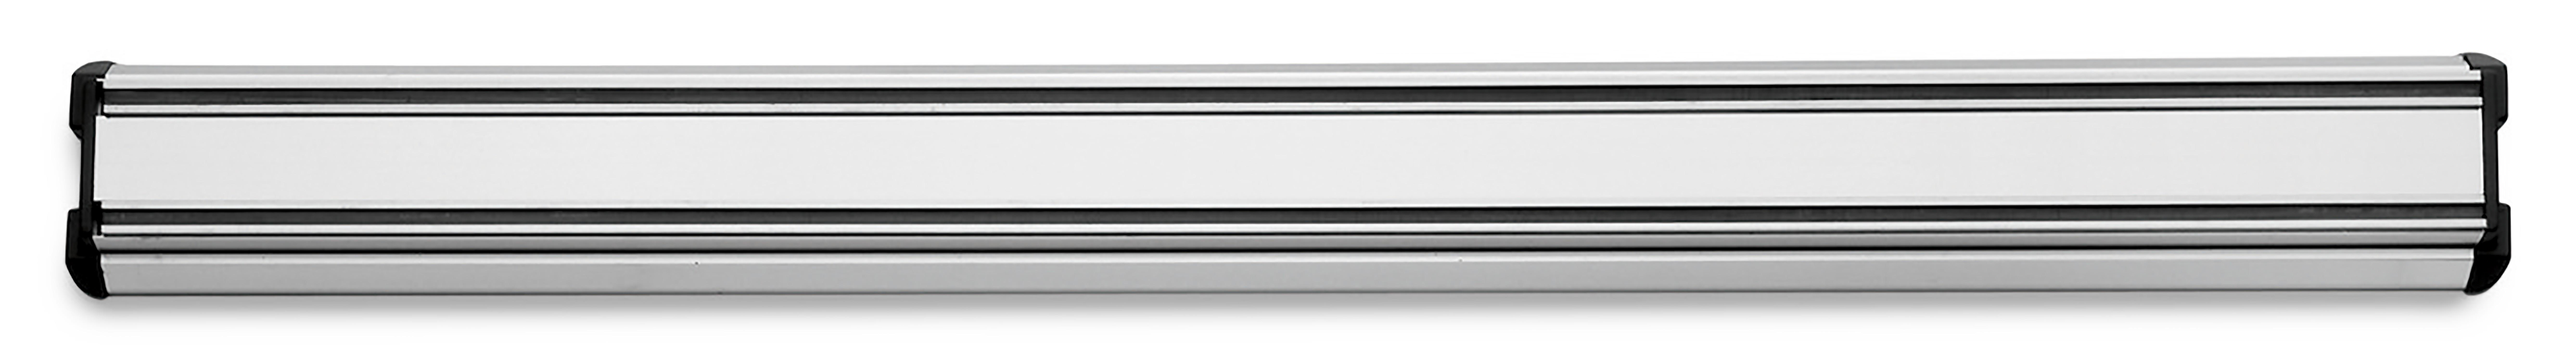 Wüsthof Magnethalter Aluminium 45cm